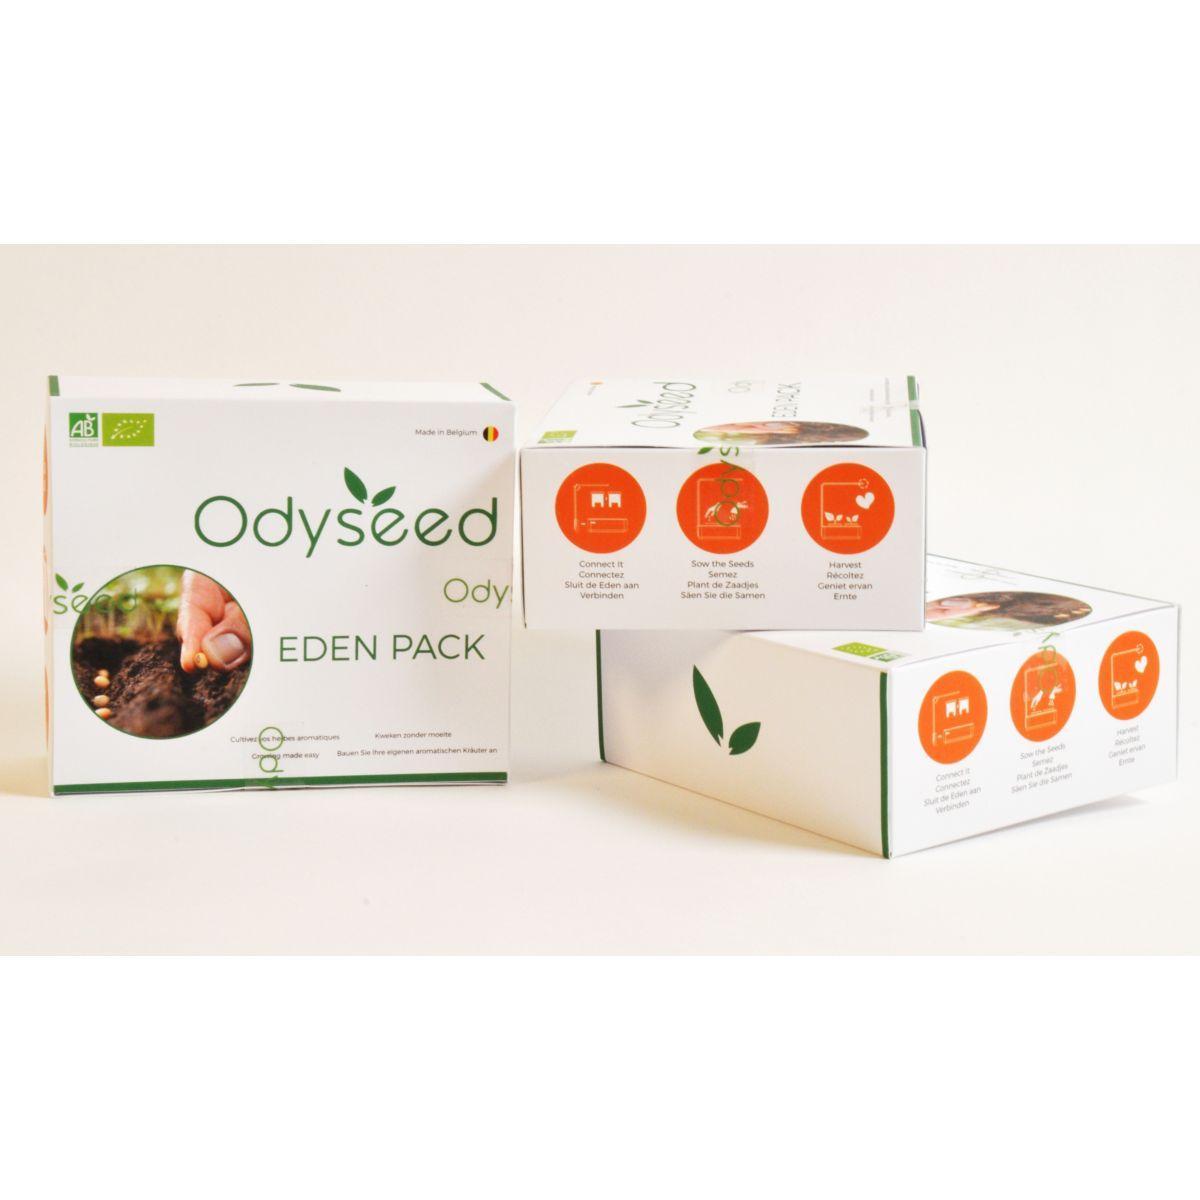 Recharge odyseed menthe & origan - 10% de remise imm�diate avec le code : paques10 (photo)